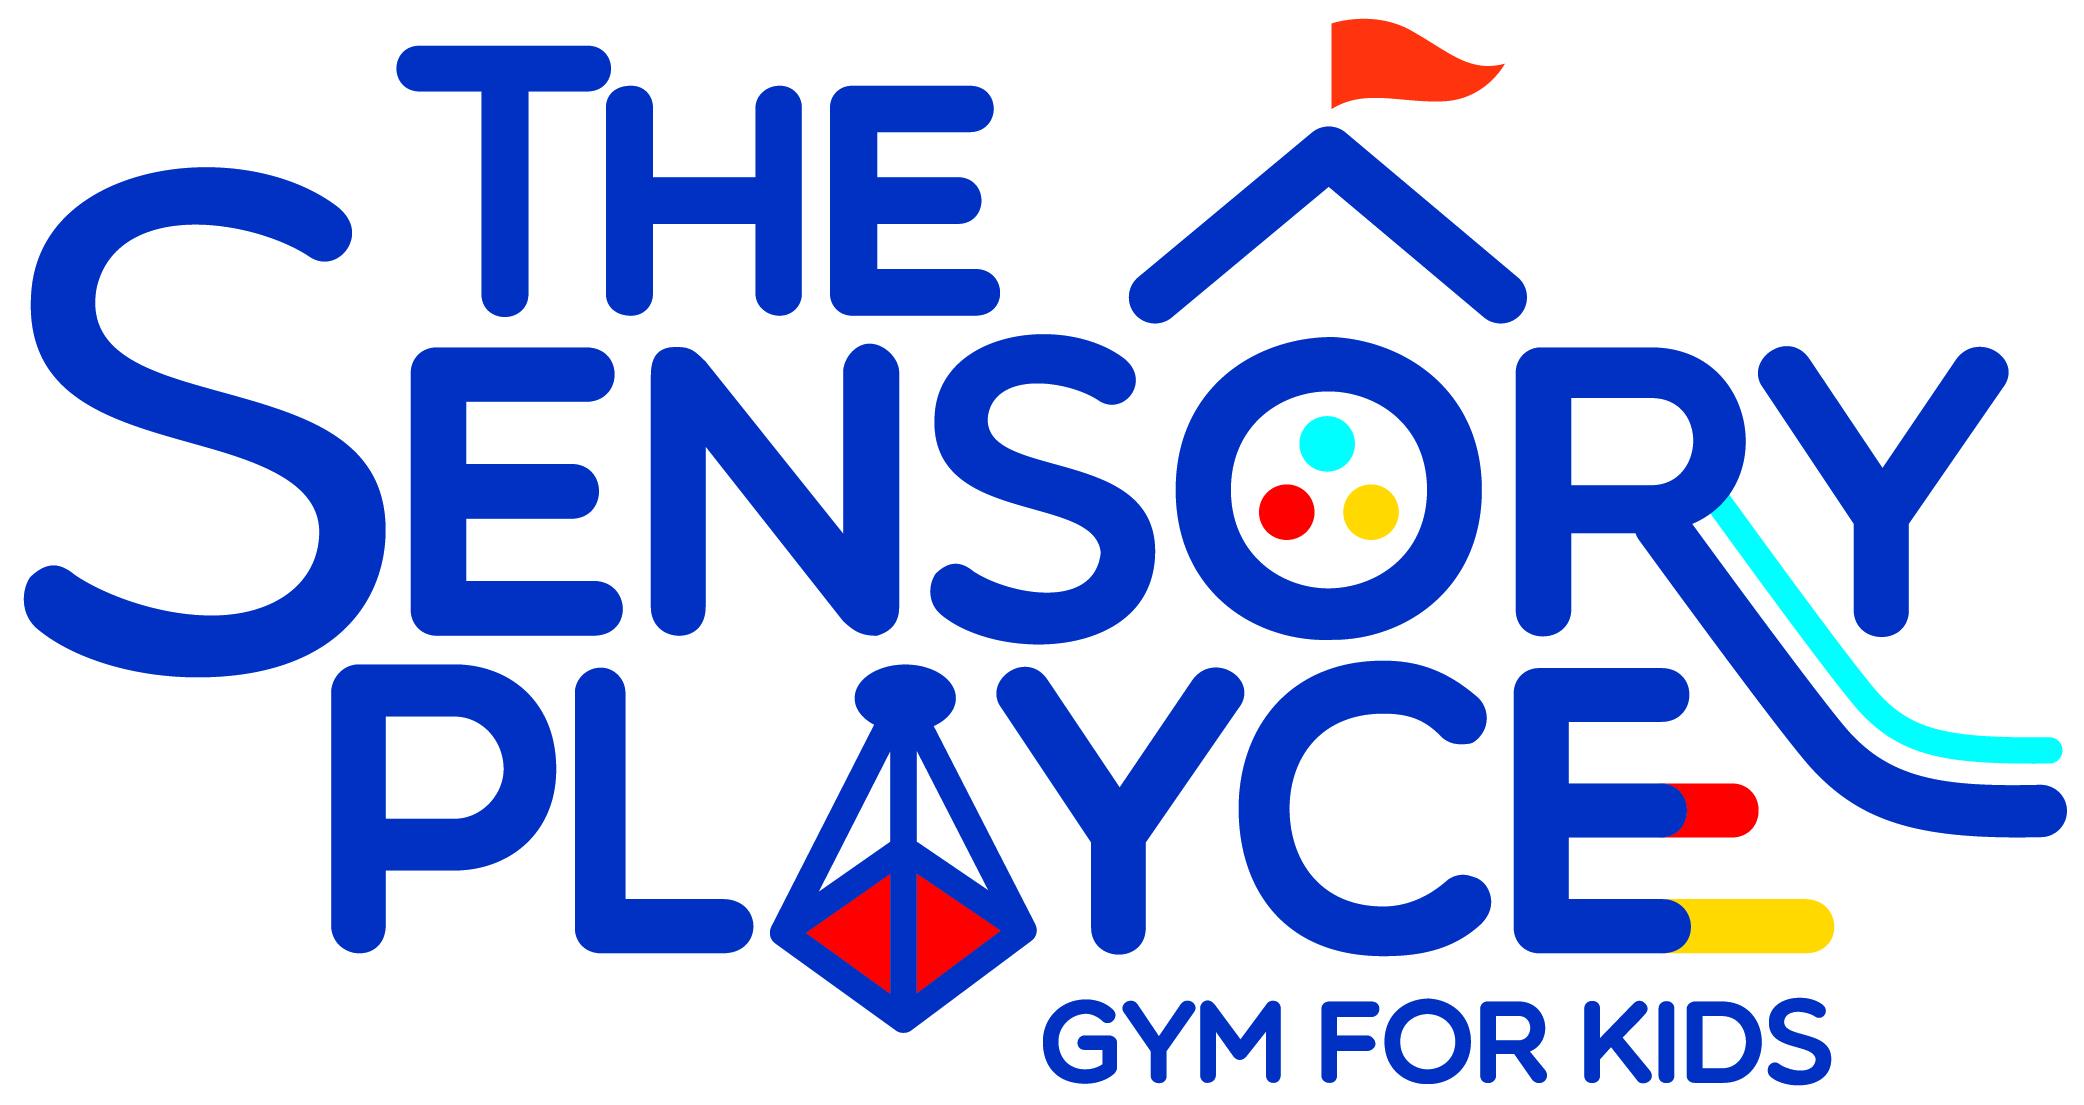 The Sensory Playce